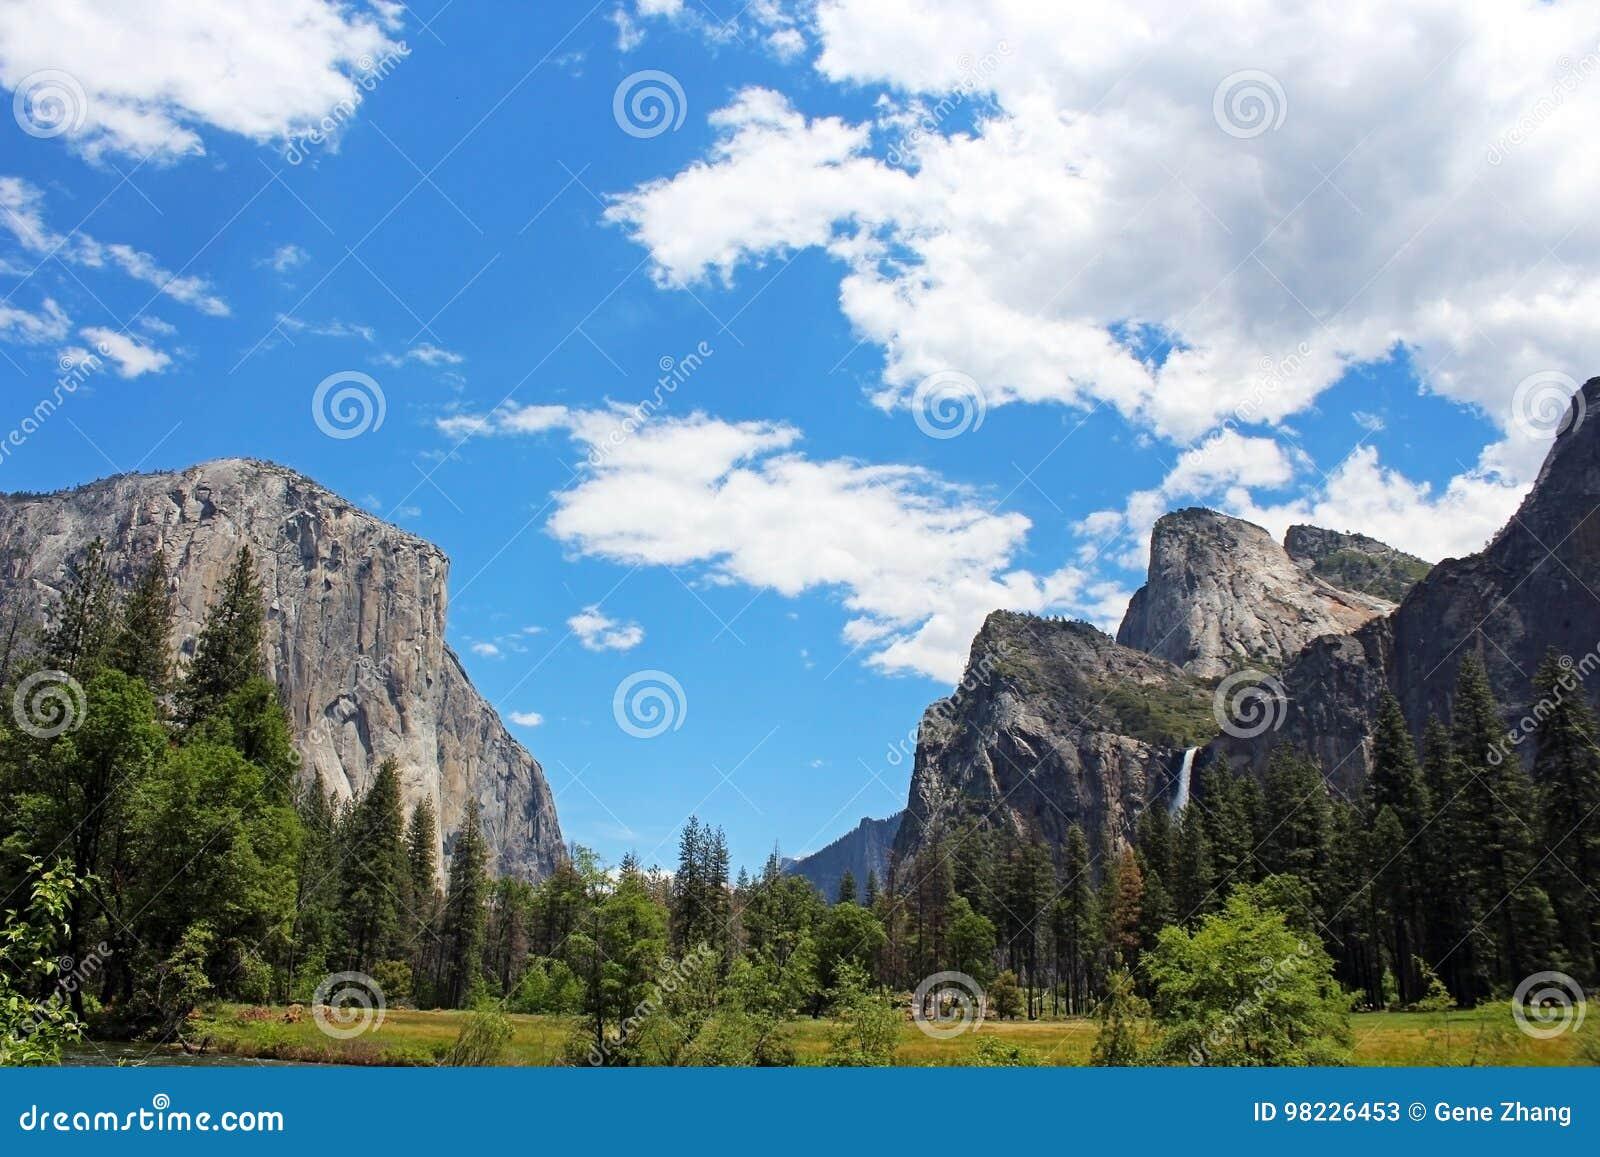 bridalveil fall and el capitan rock, yosemite valley, yosemite